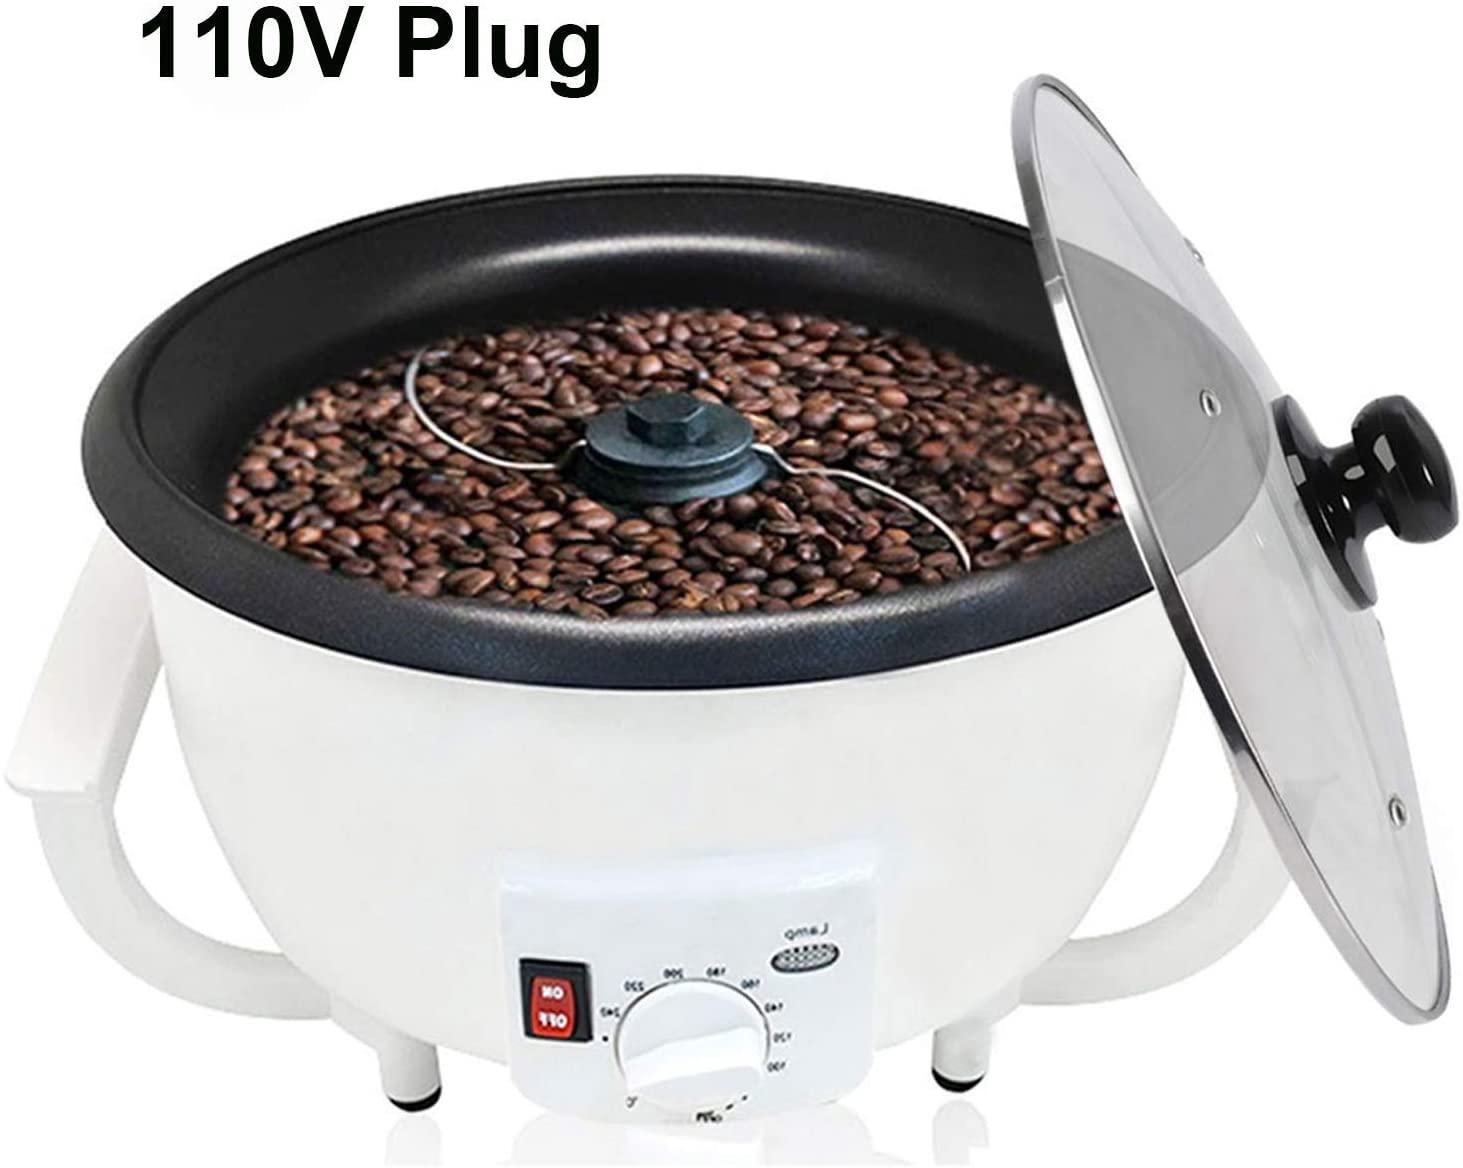 Coffee Bean Roaster Machine, Coffee Roaster Machine for Home Use 110V Electric Household Peanut Nuts Coffee Roasting Machine